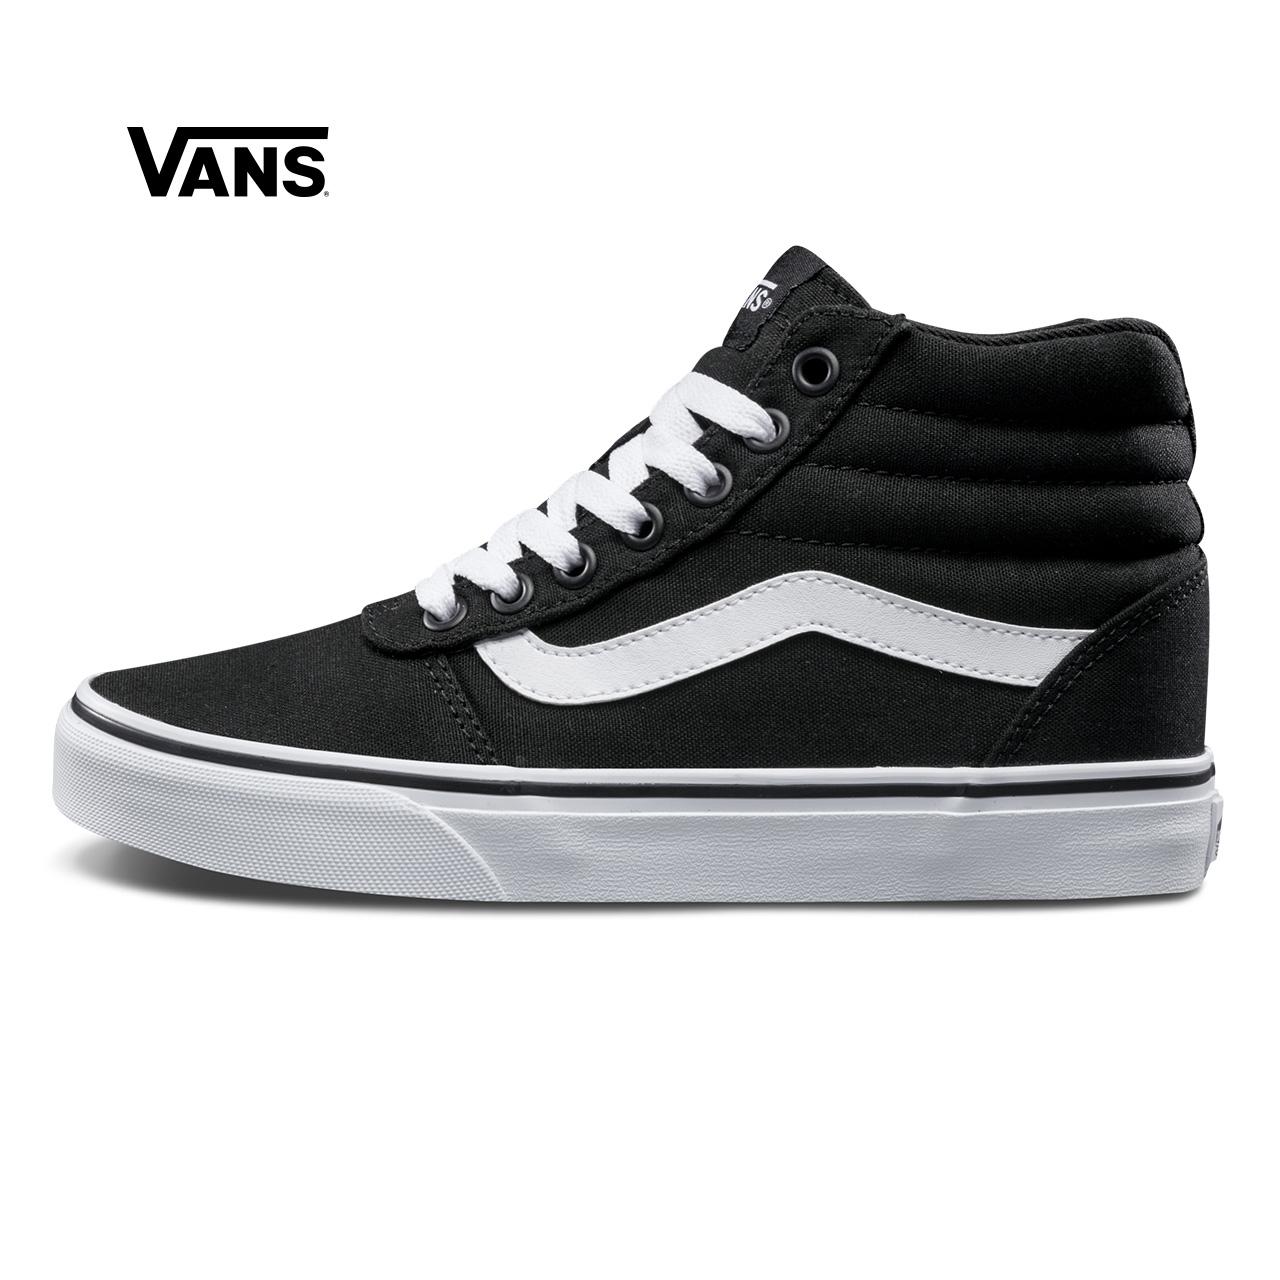 Vans 范斯官方女款侧边条纹板鞋|VN0A3IUO187